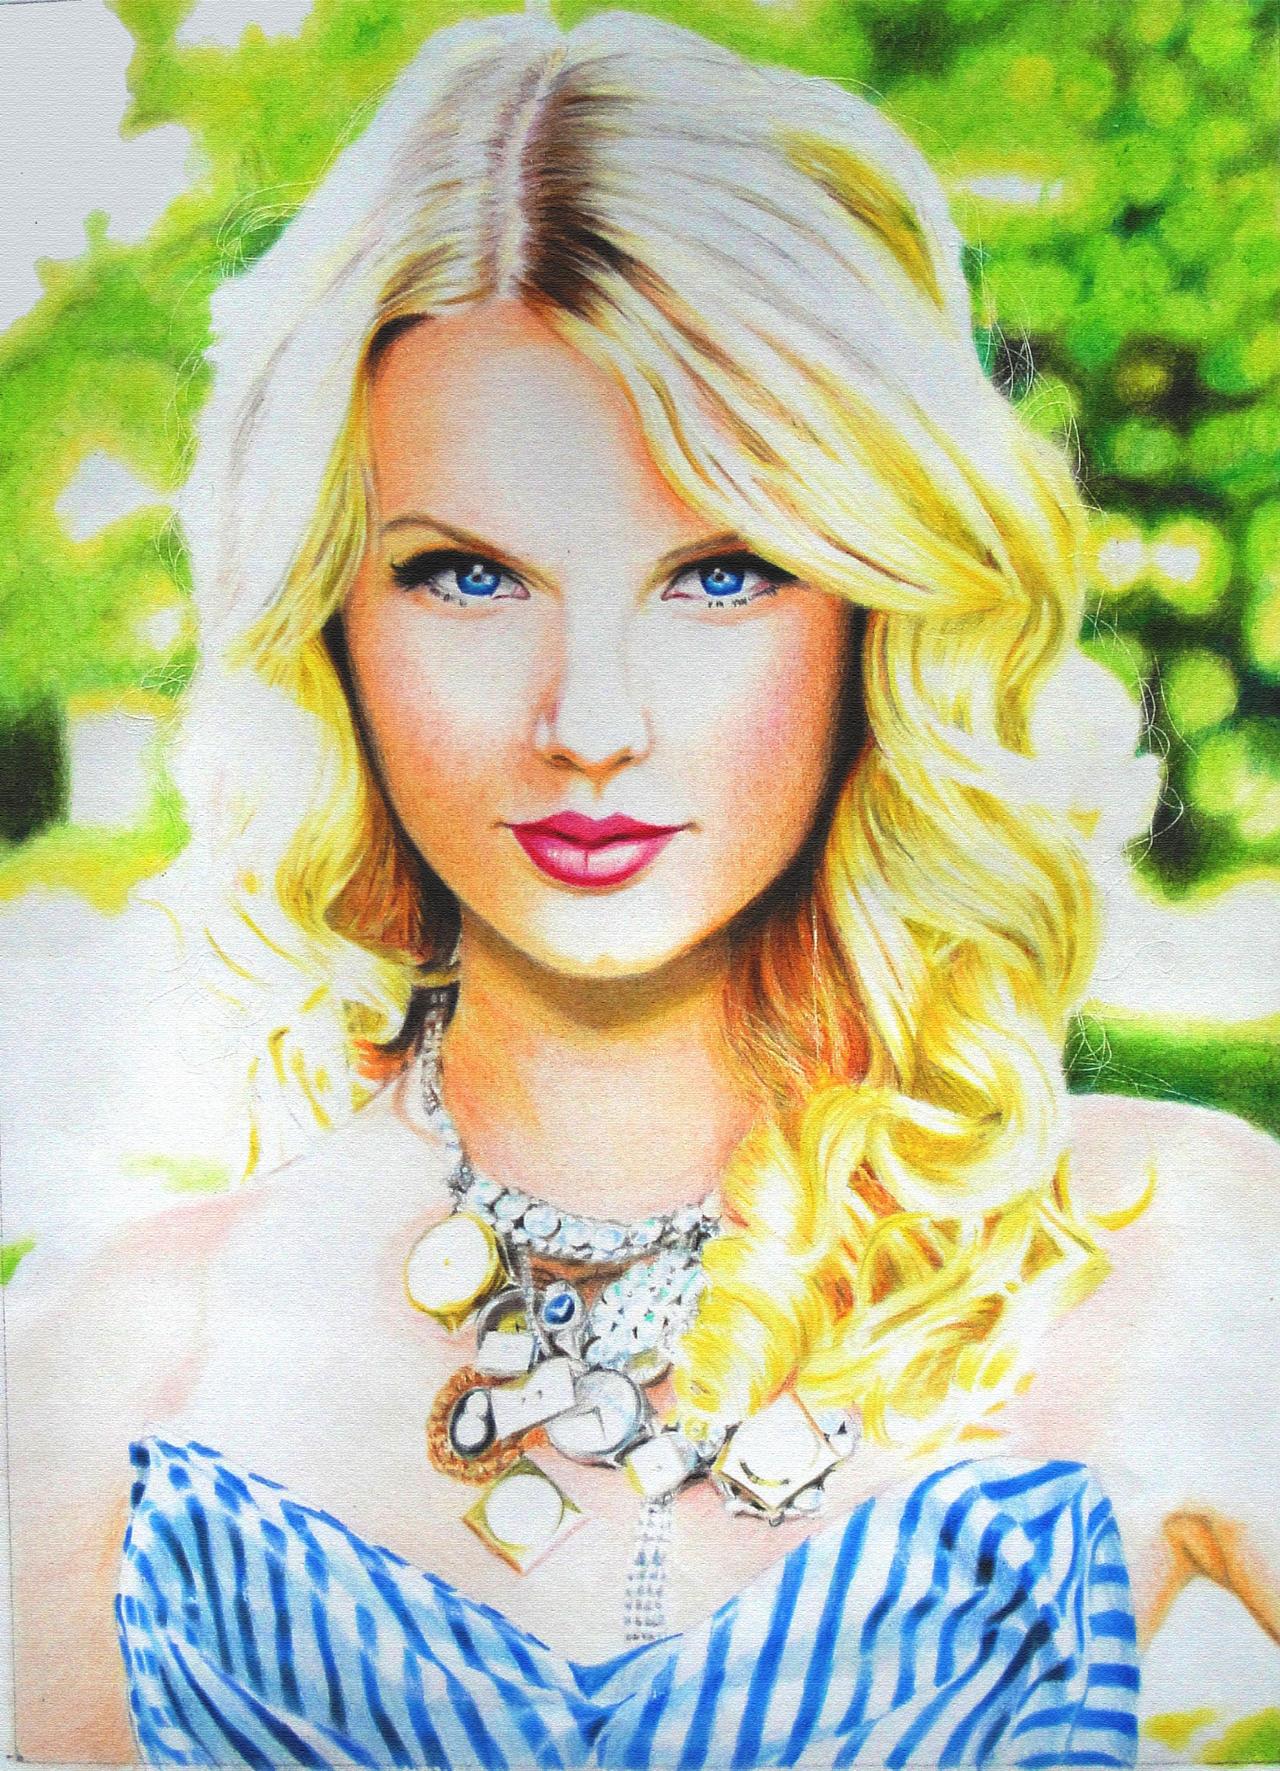 Taylor Swift by JairoxD